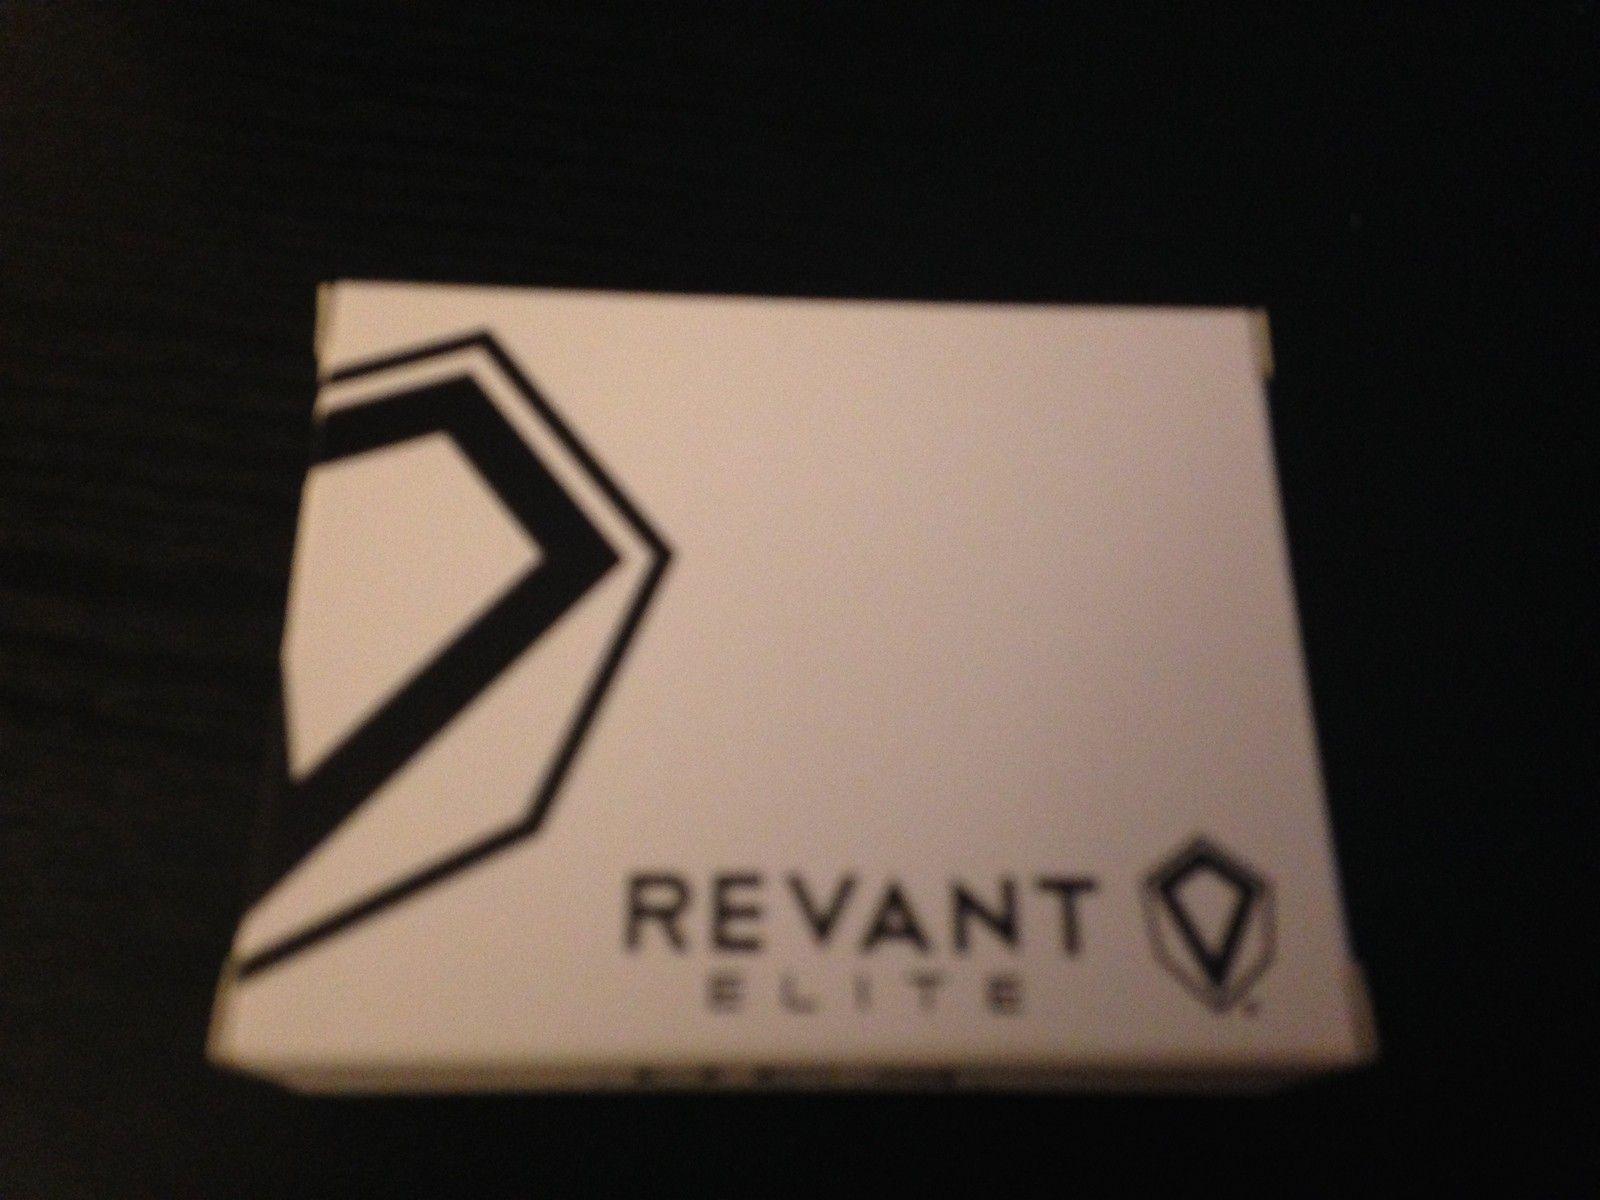 Revant Optics HC3 Elite Mirrorshield Lens Review - IMG_1729.jpg